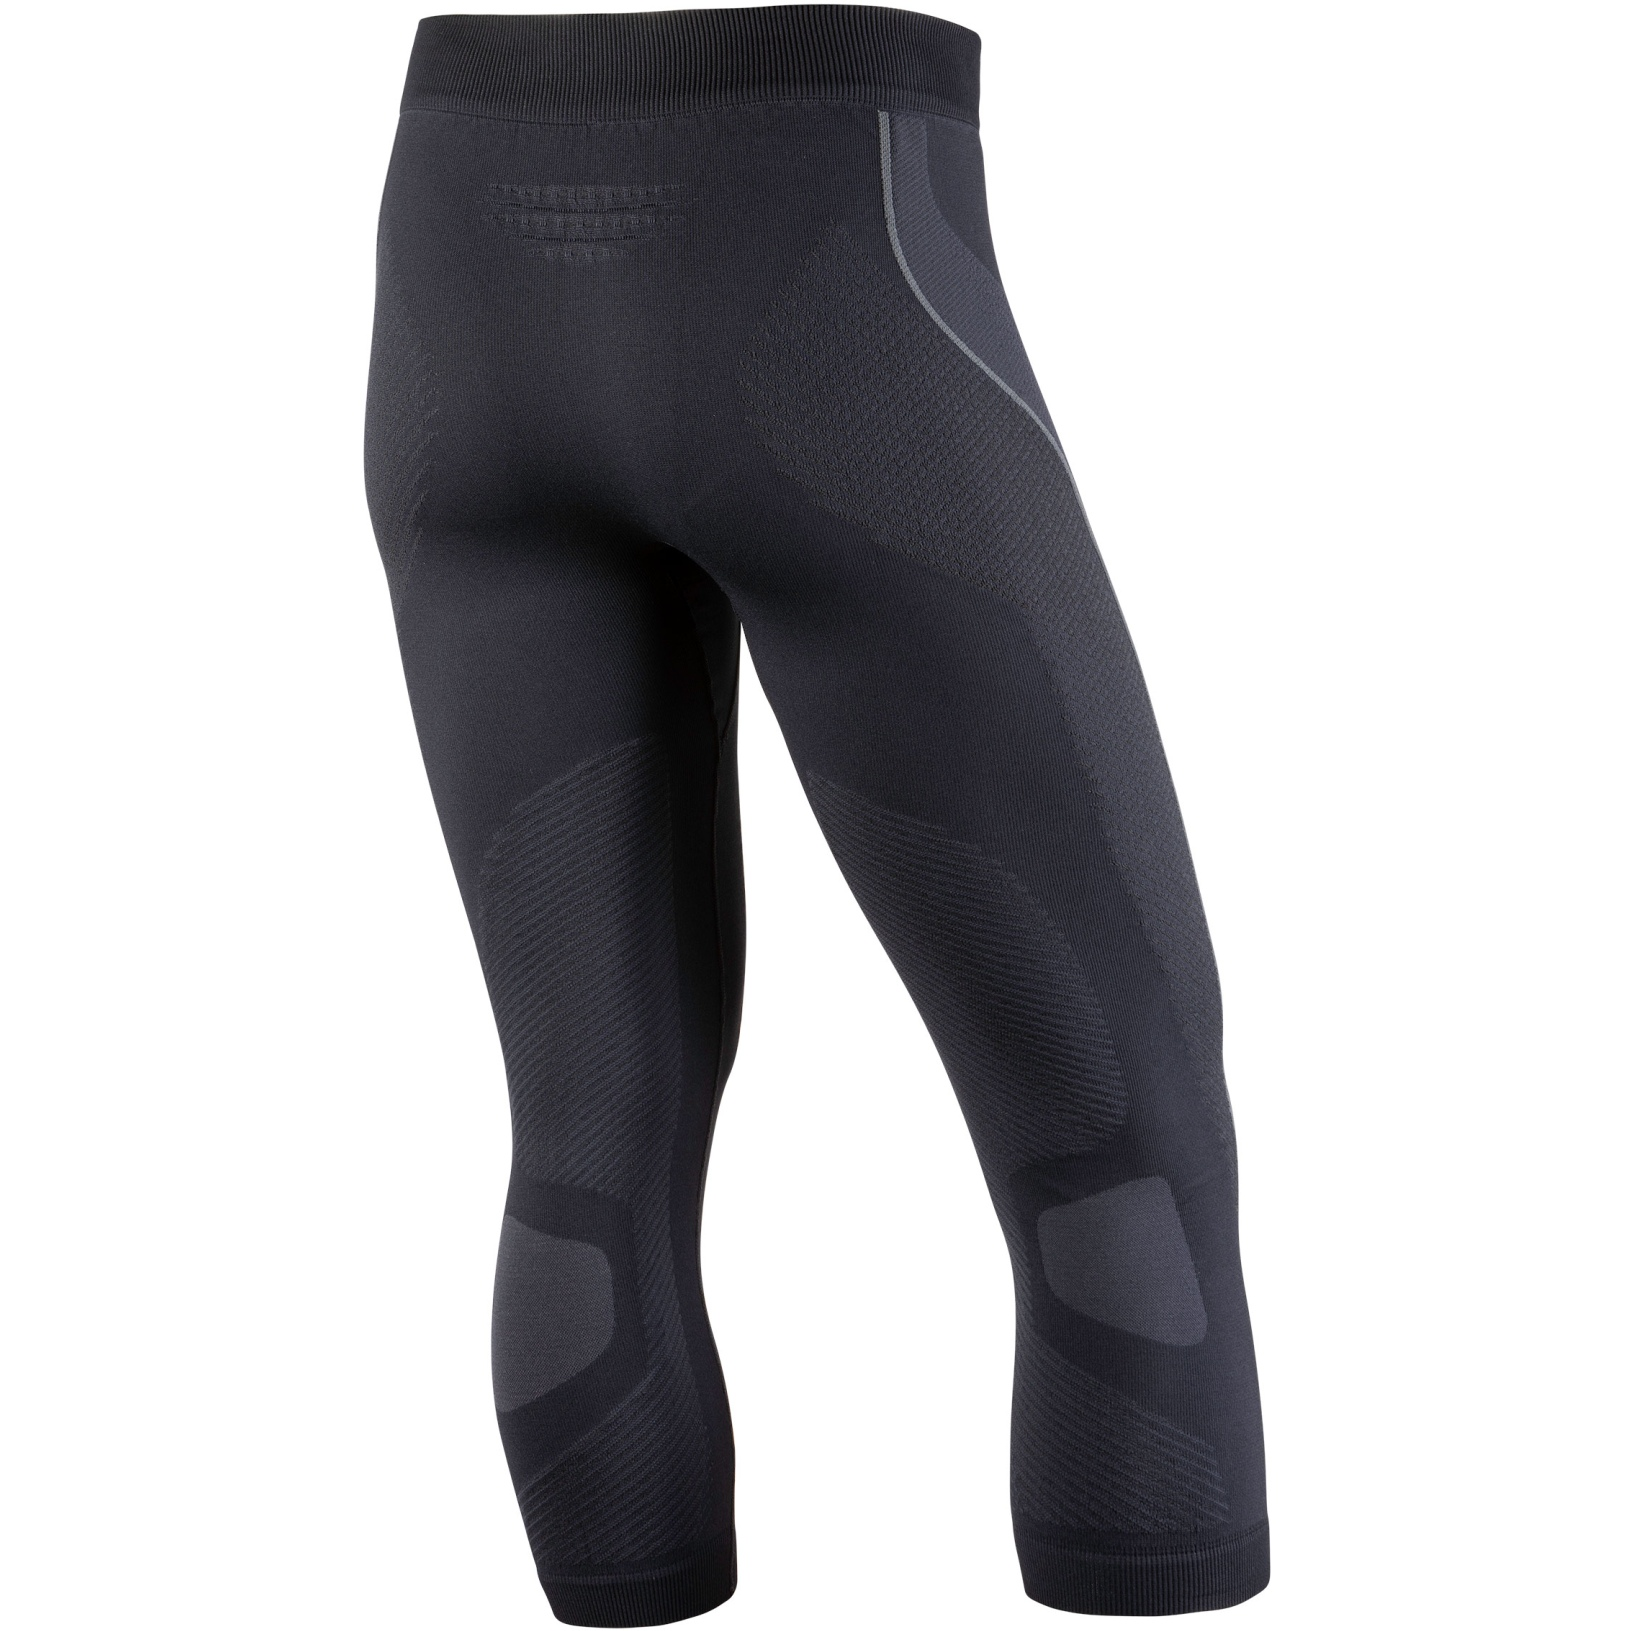 Image of UYN Ambityon Underwear Pants Medium - Blackboard/Black/White